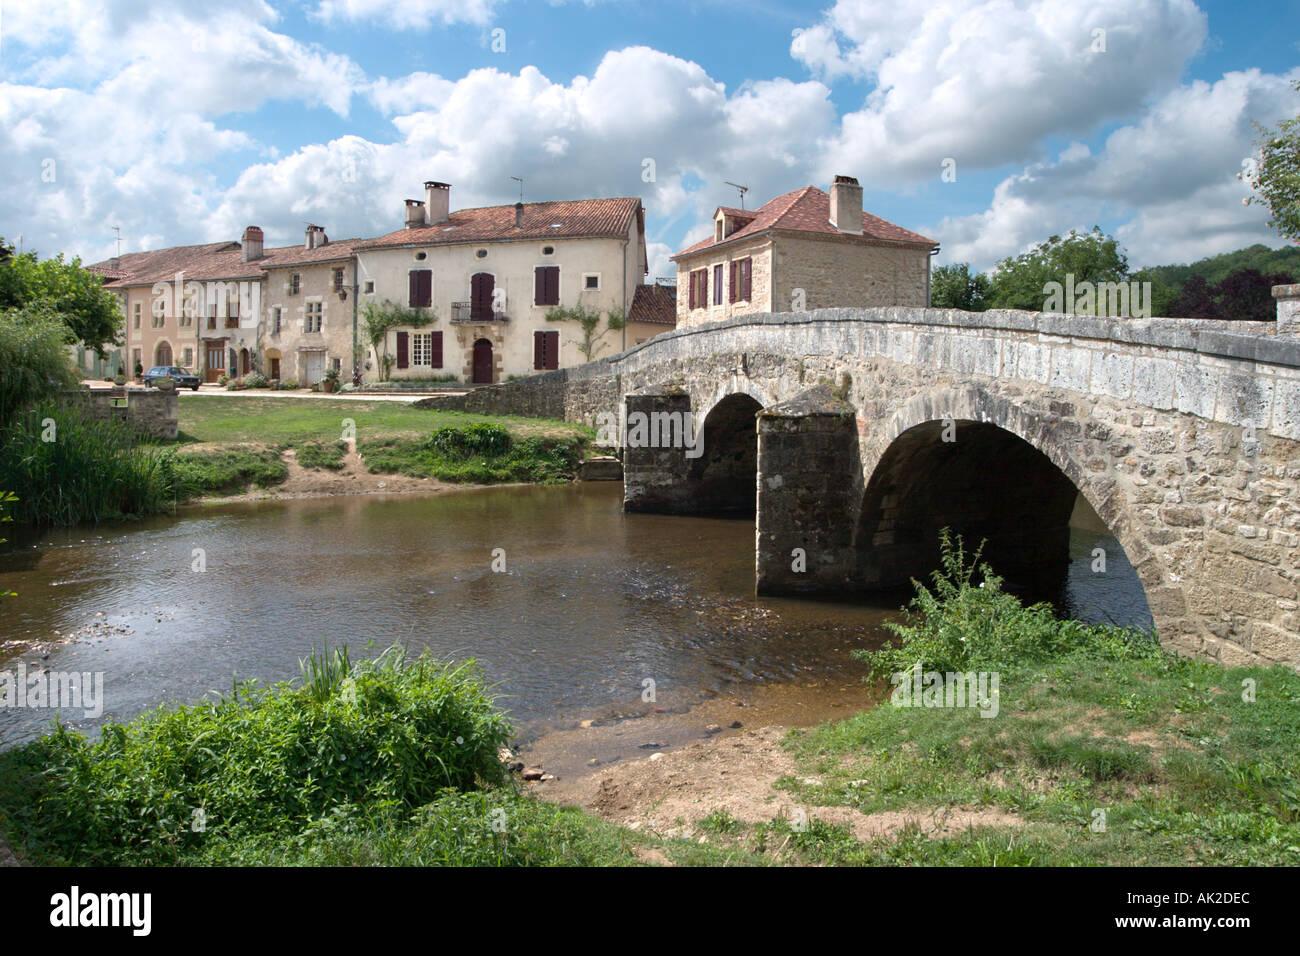 Bridge over the river in St Jean de Cole, Dordogne, France - Stock Image